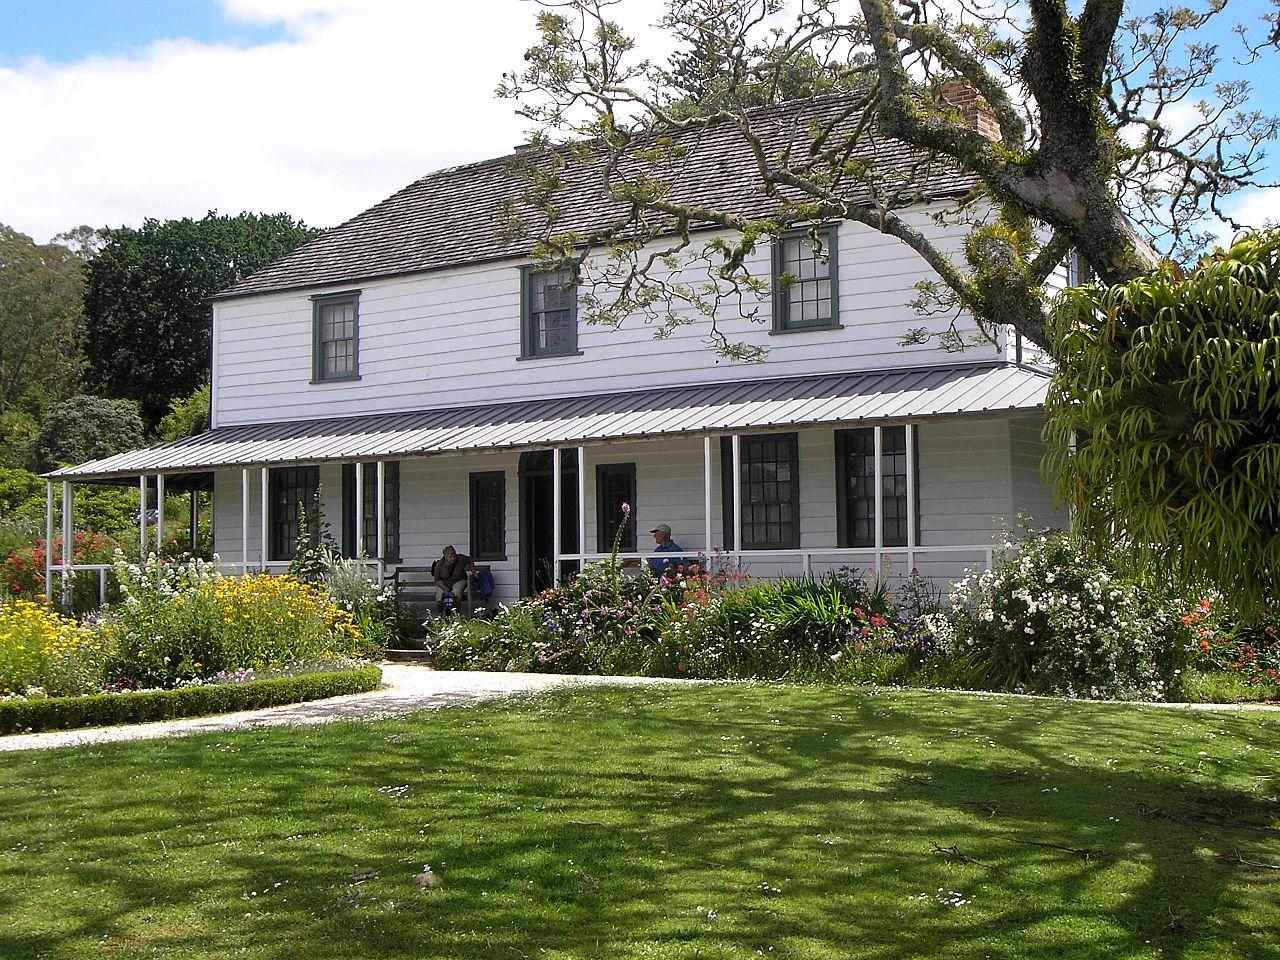 Kerikeri New Zealand  city photos gallery : Kemp House, Kerikeri, New Zealand Wikipedia